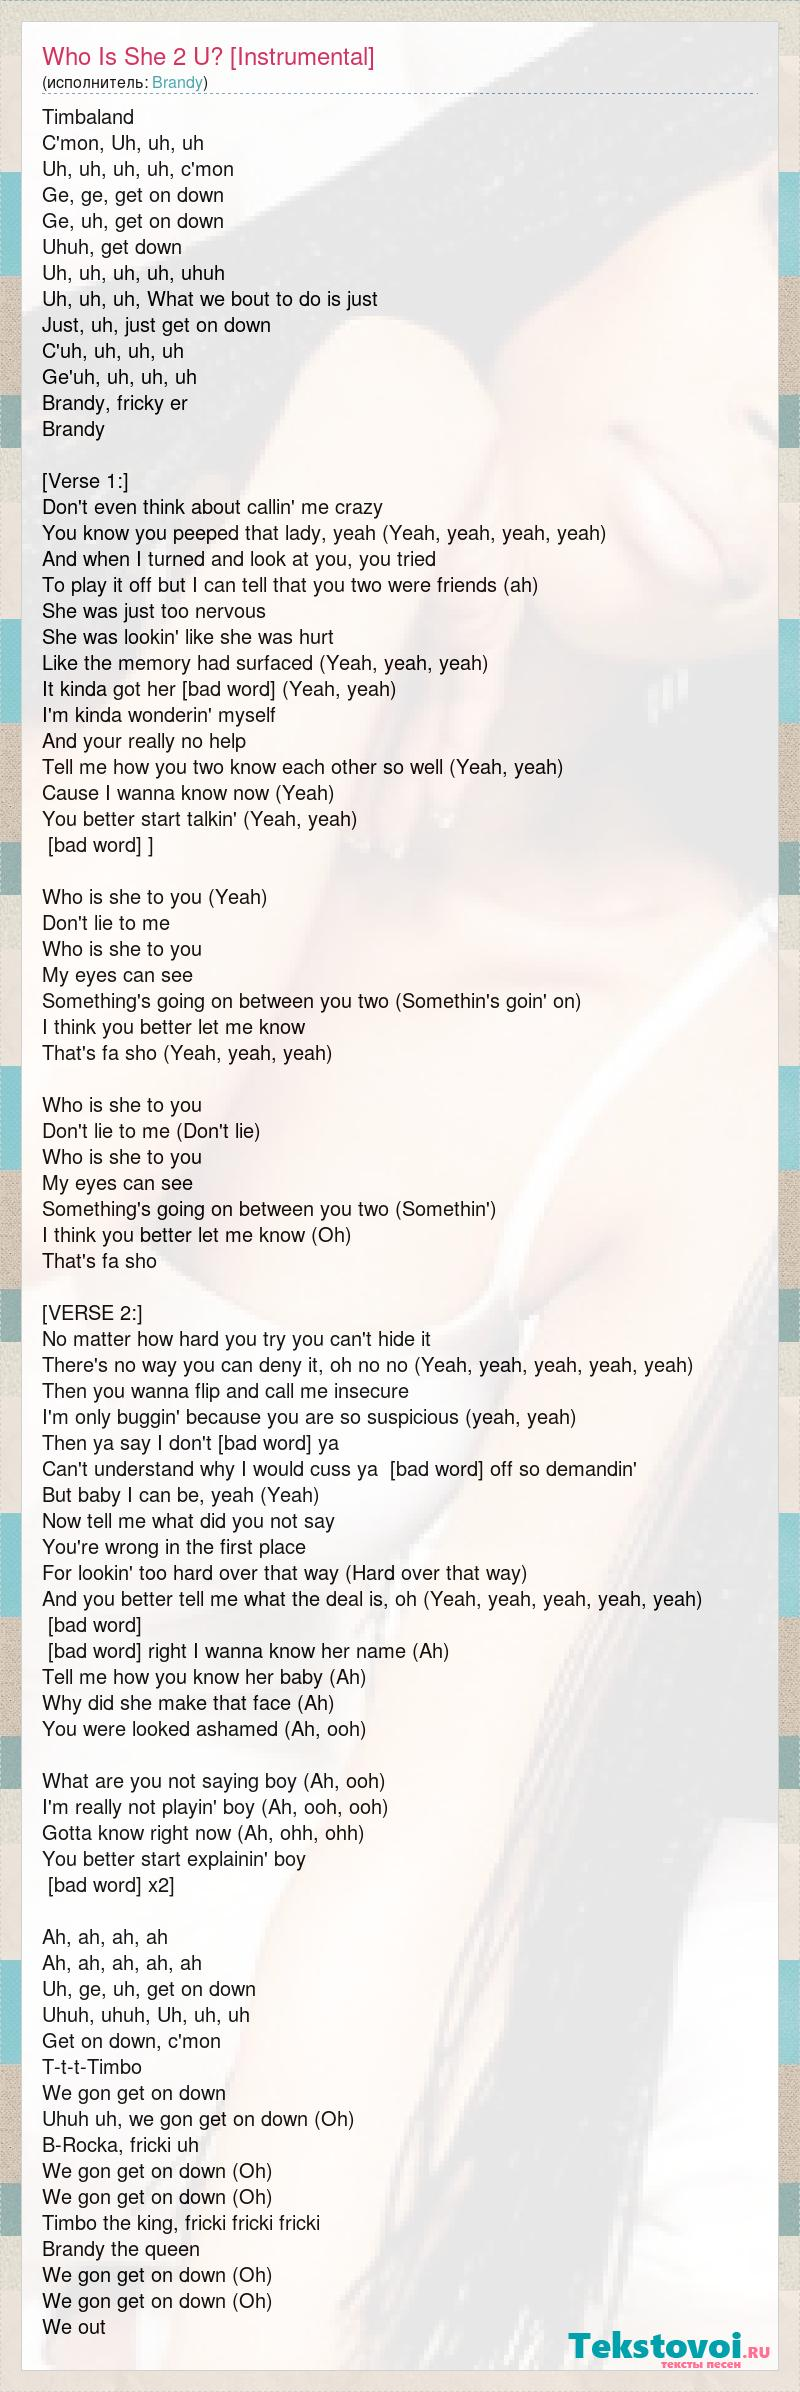 Brandy: Who Is She 2 U? [Instrumental] слова песни